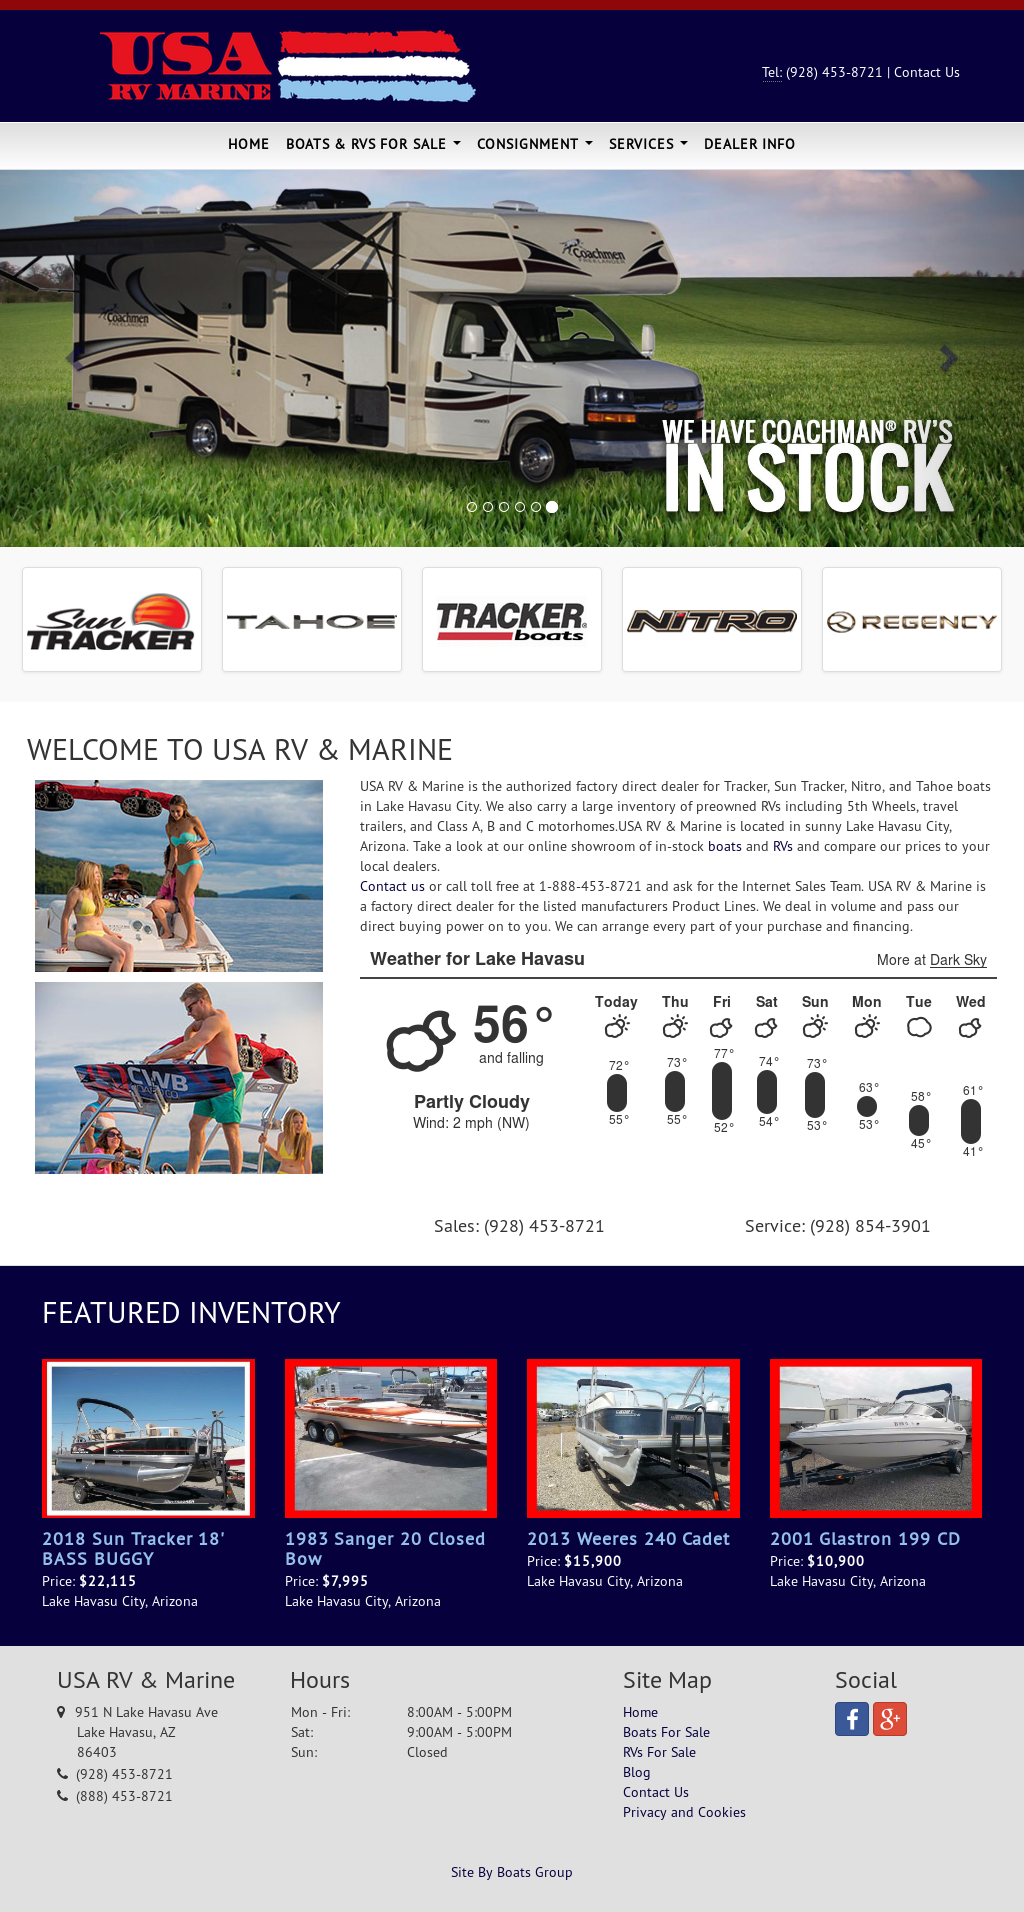 USA RV and Marine website history